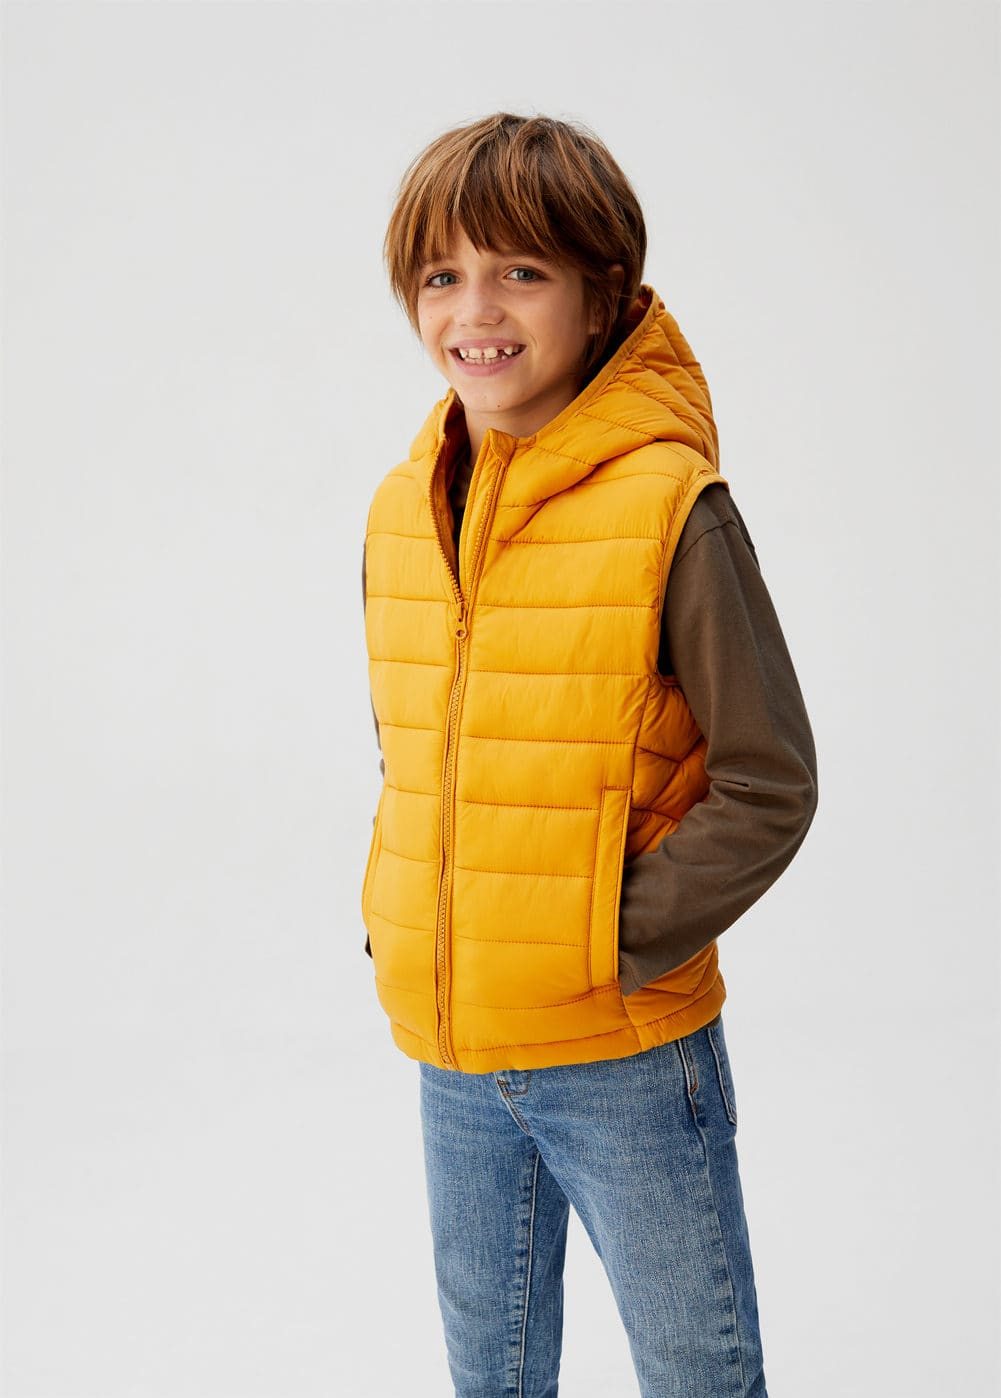 o-unicovp6:chaleco acolchado impermeable capucha